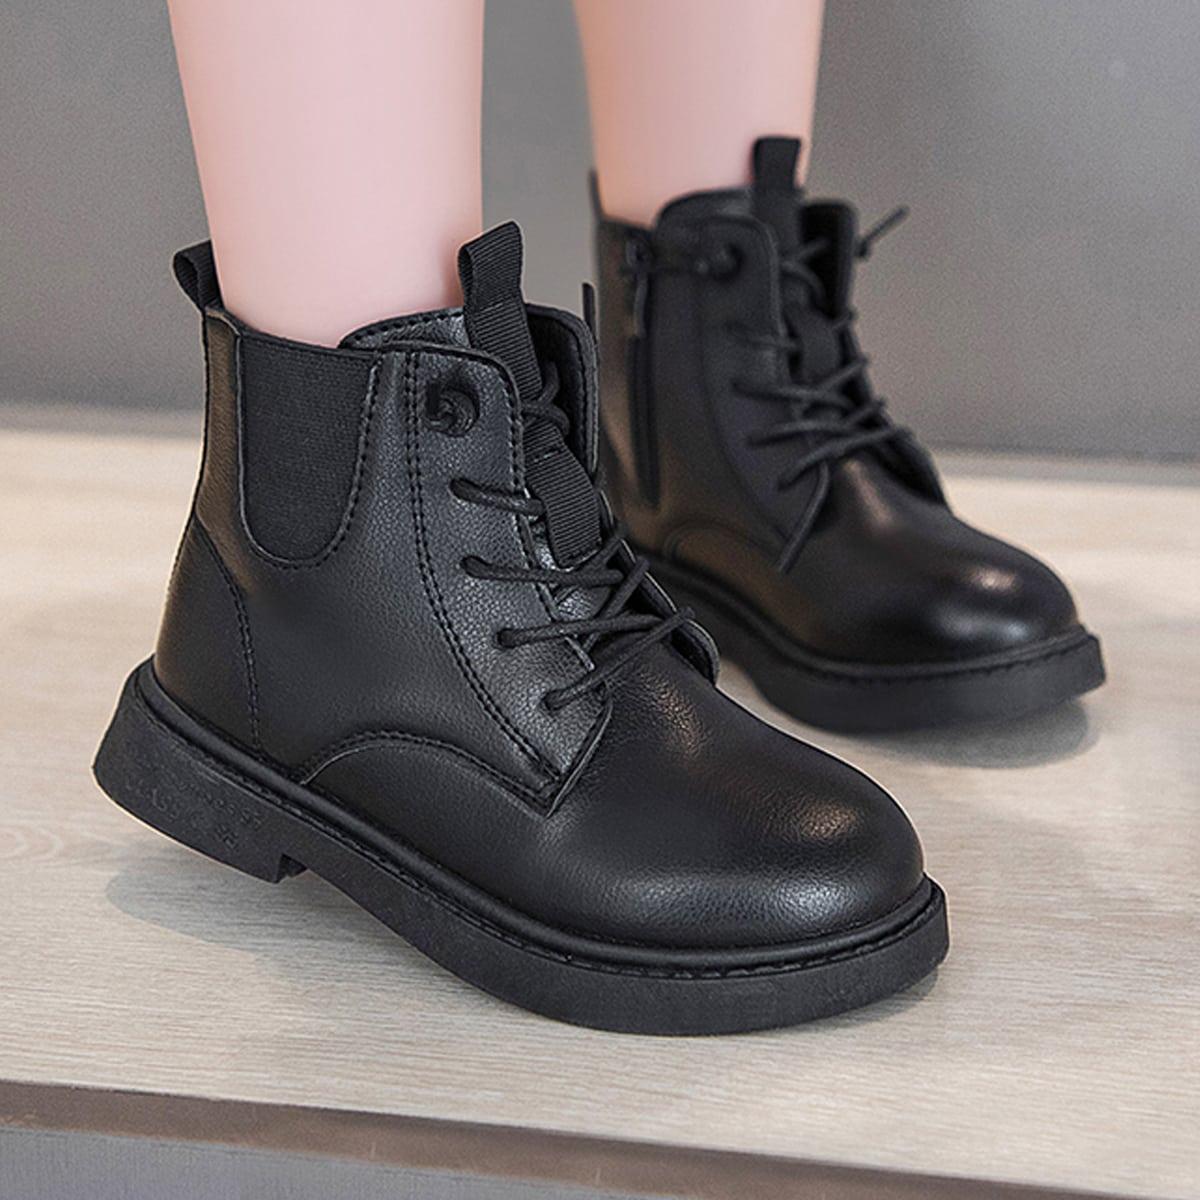 Минималистичные ботинки на шнурке SheIn sk2108039313751066